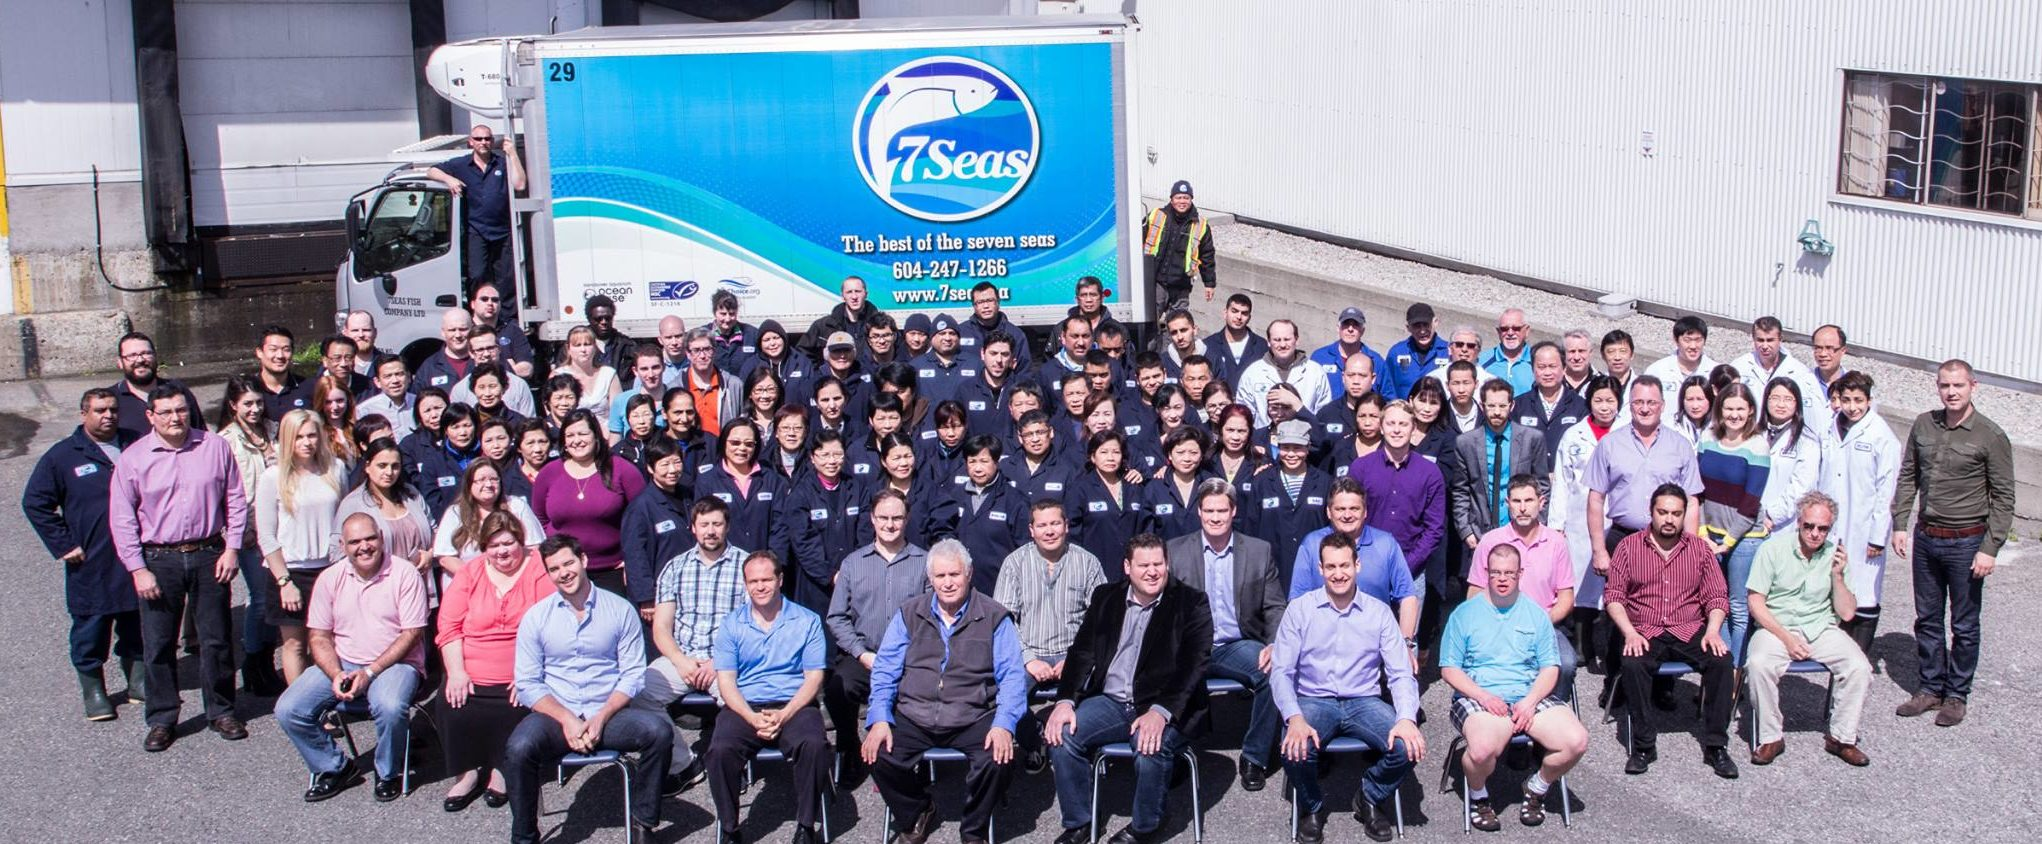 Seven Seas Vancouver Fish Company | 7 Seas Canadian Fish Company